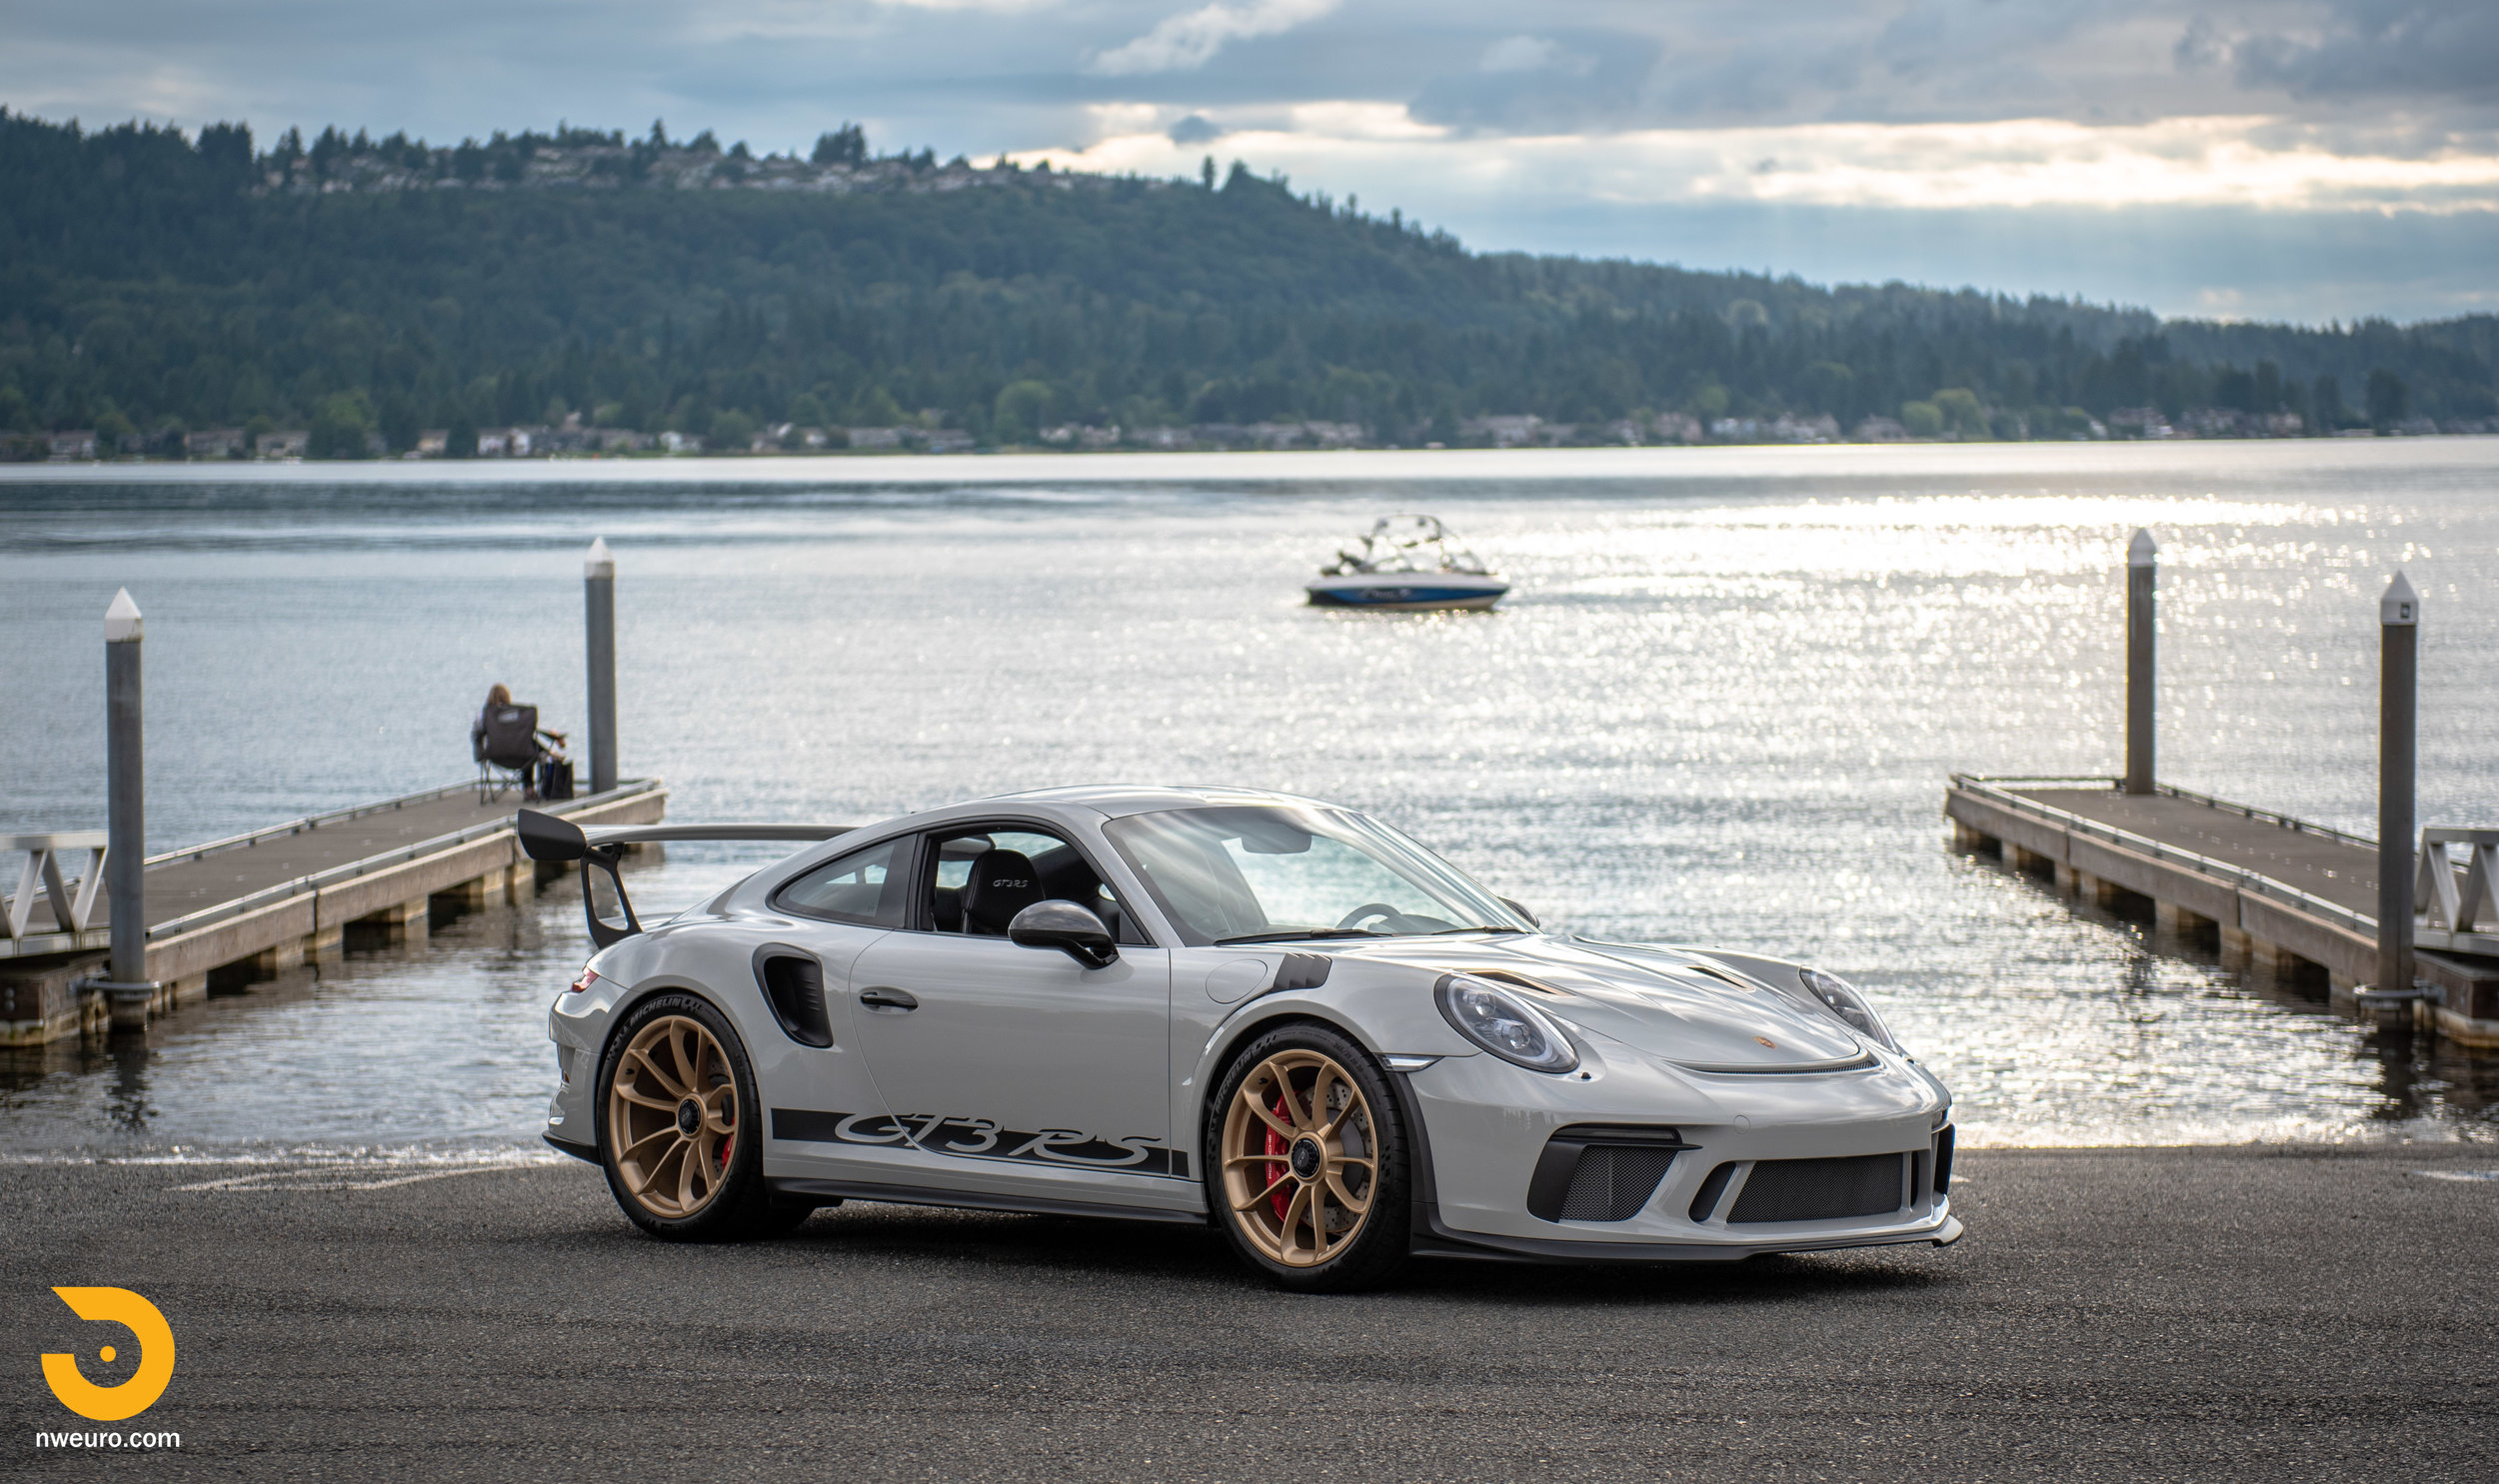 2019 Porsche GT3 RS - Chalk-16.jpg